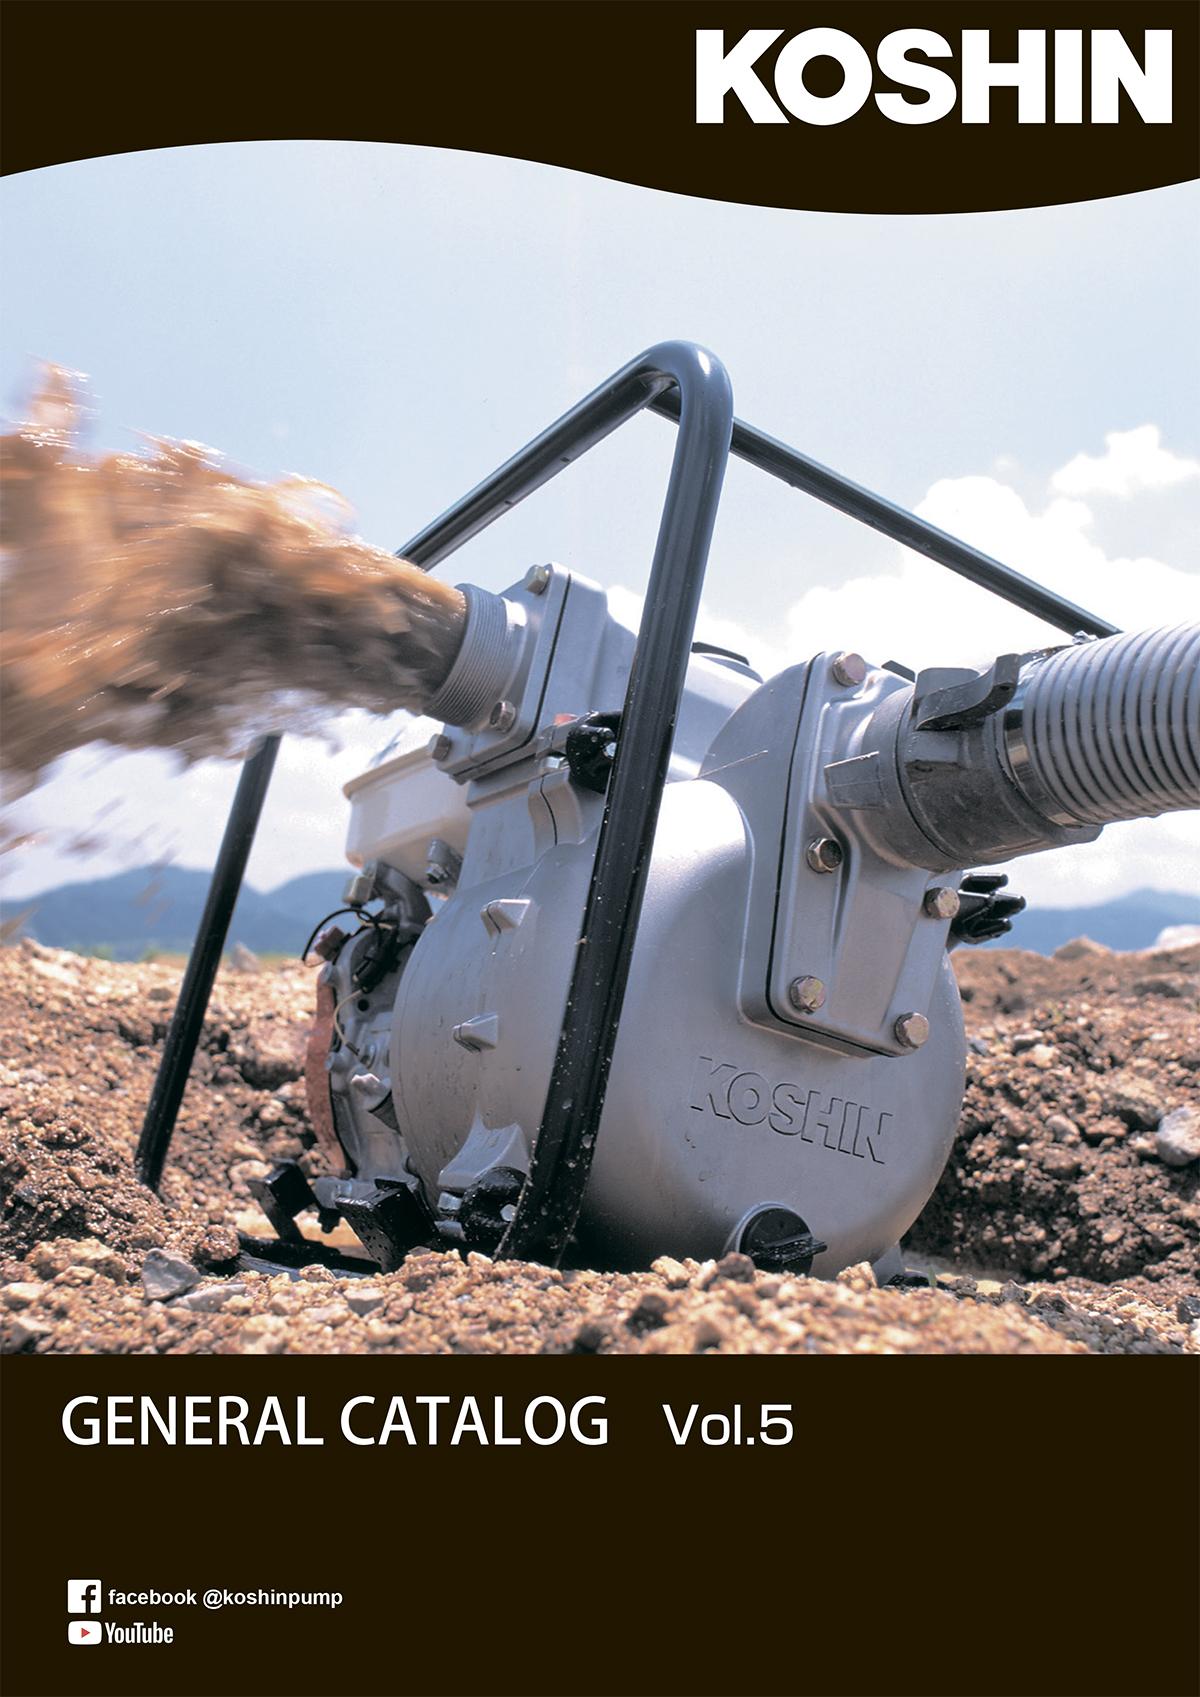 GENERAL (new) Koshin Ppoducts Catalog 2020 Vol.5 auf English (in English)